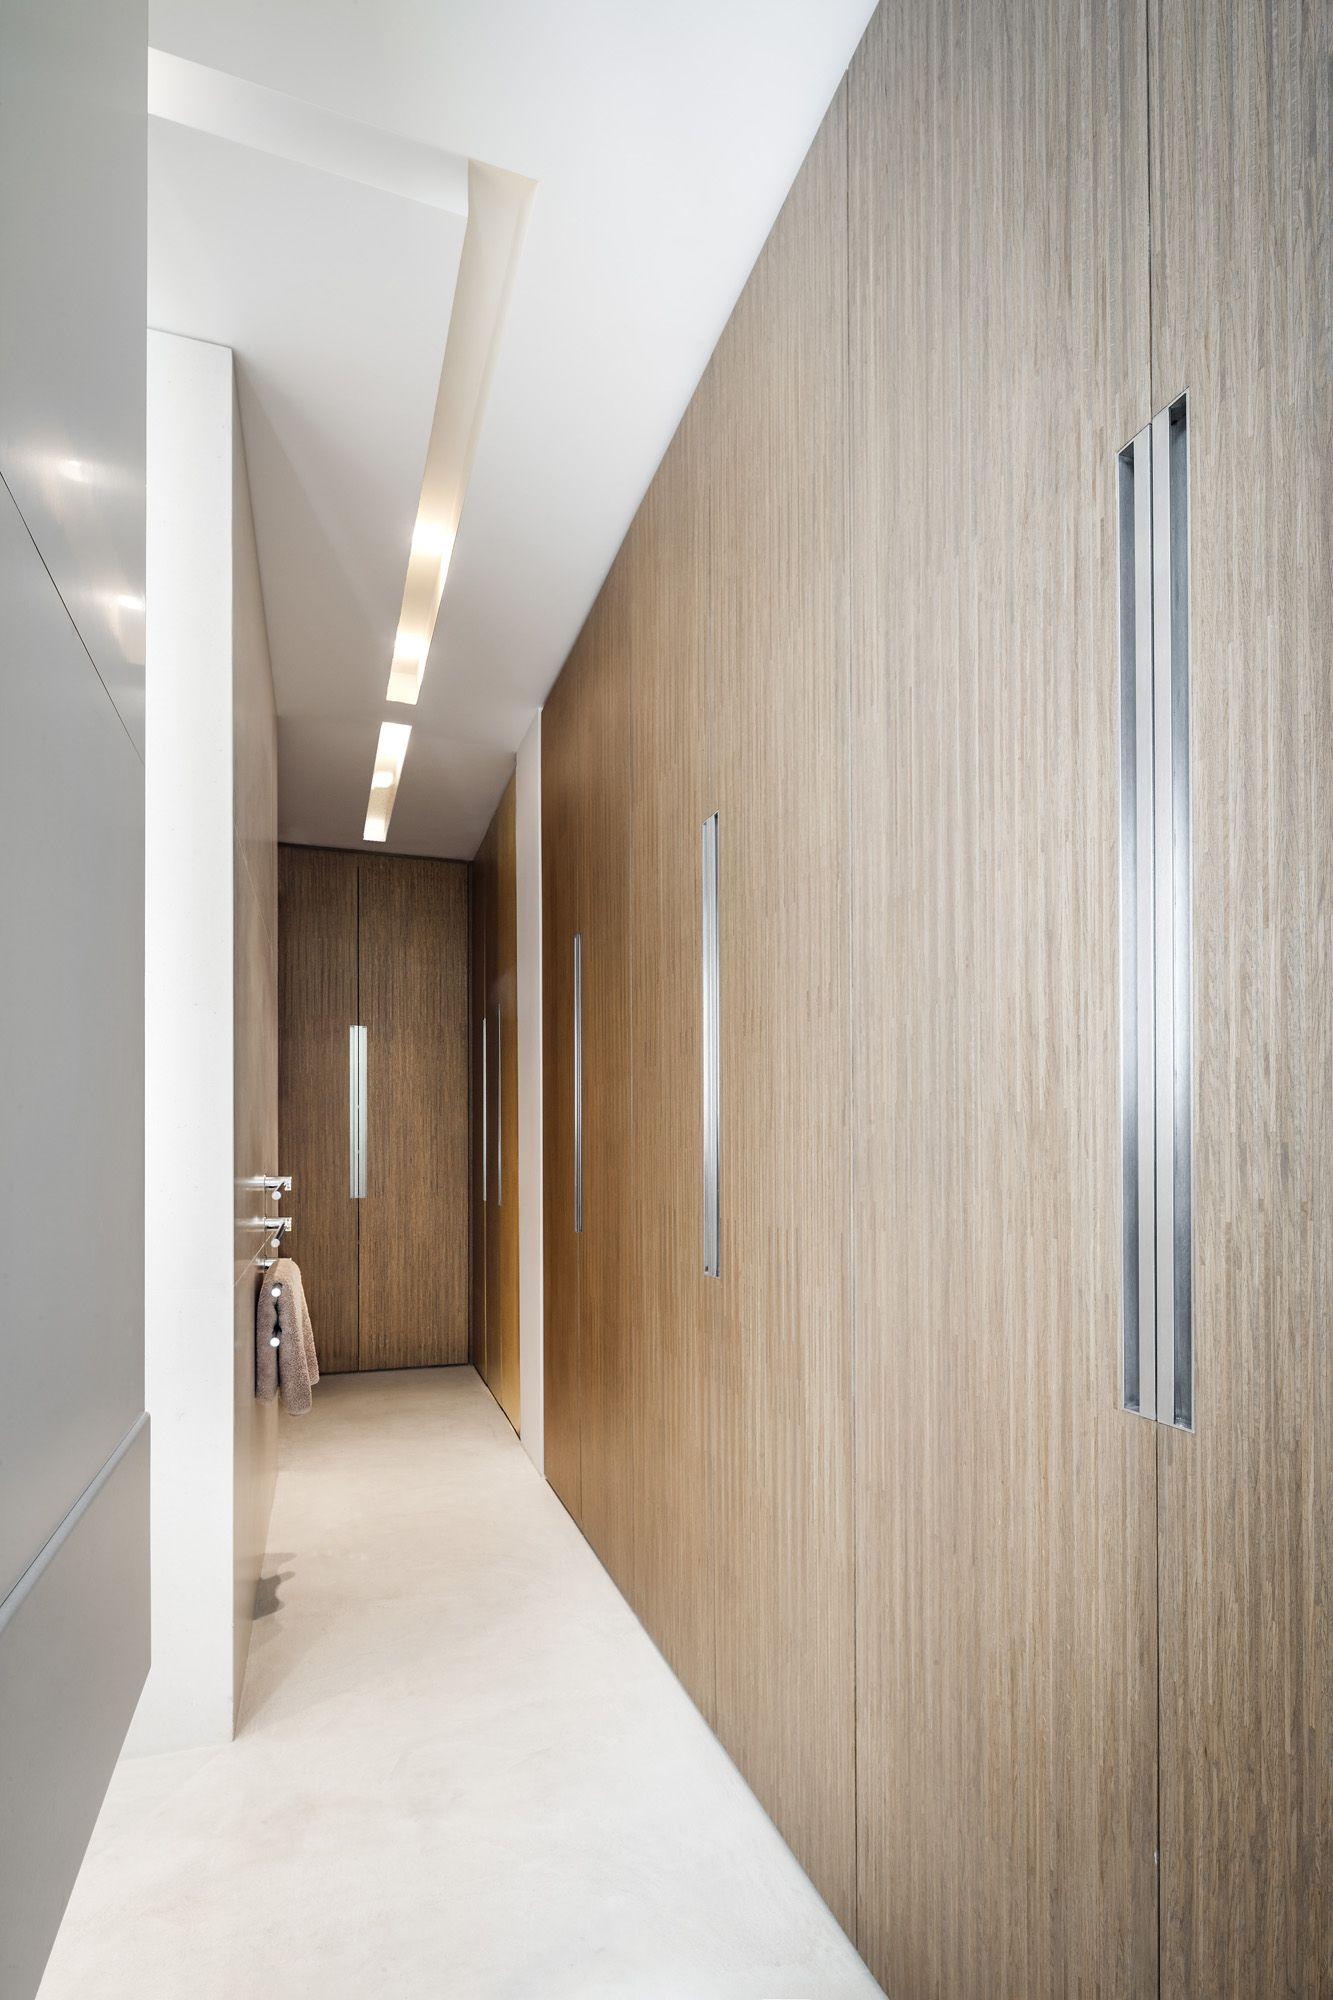 PAX white wardrobe with STOCKHOLM walnut veneer doors and URSHULT